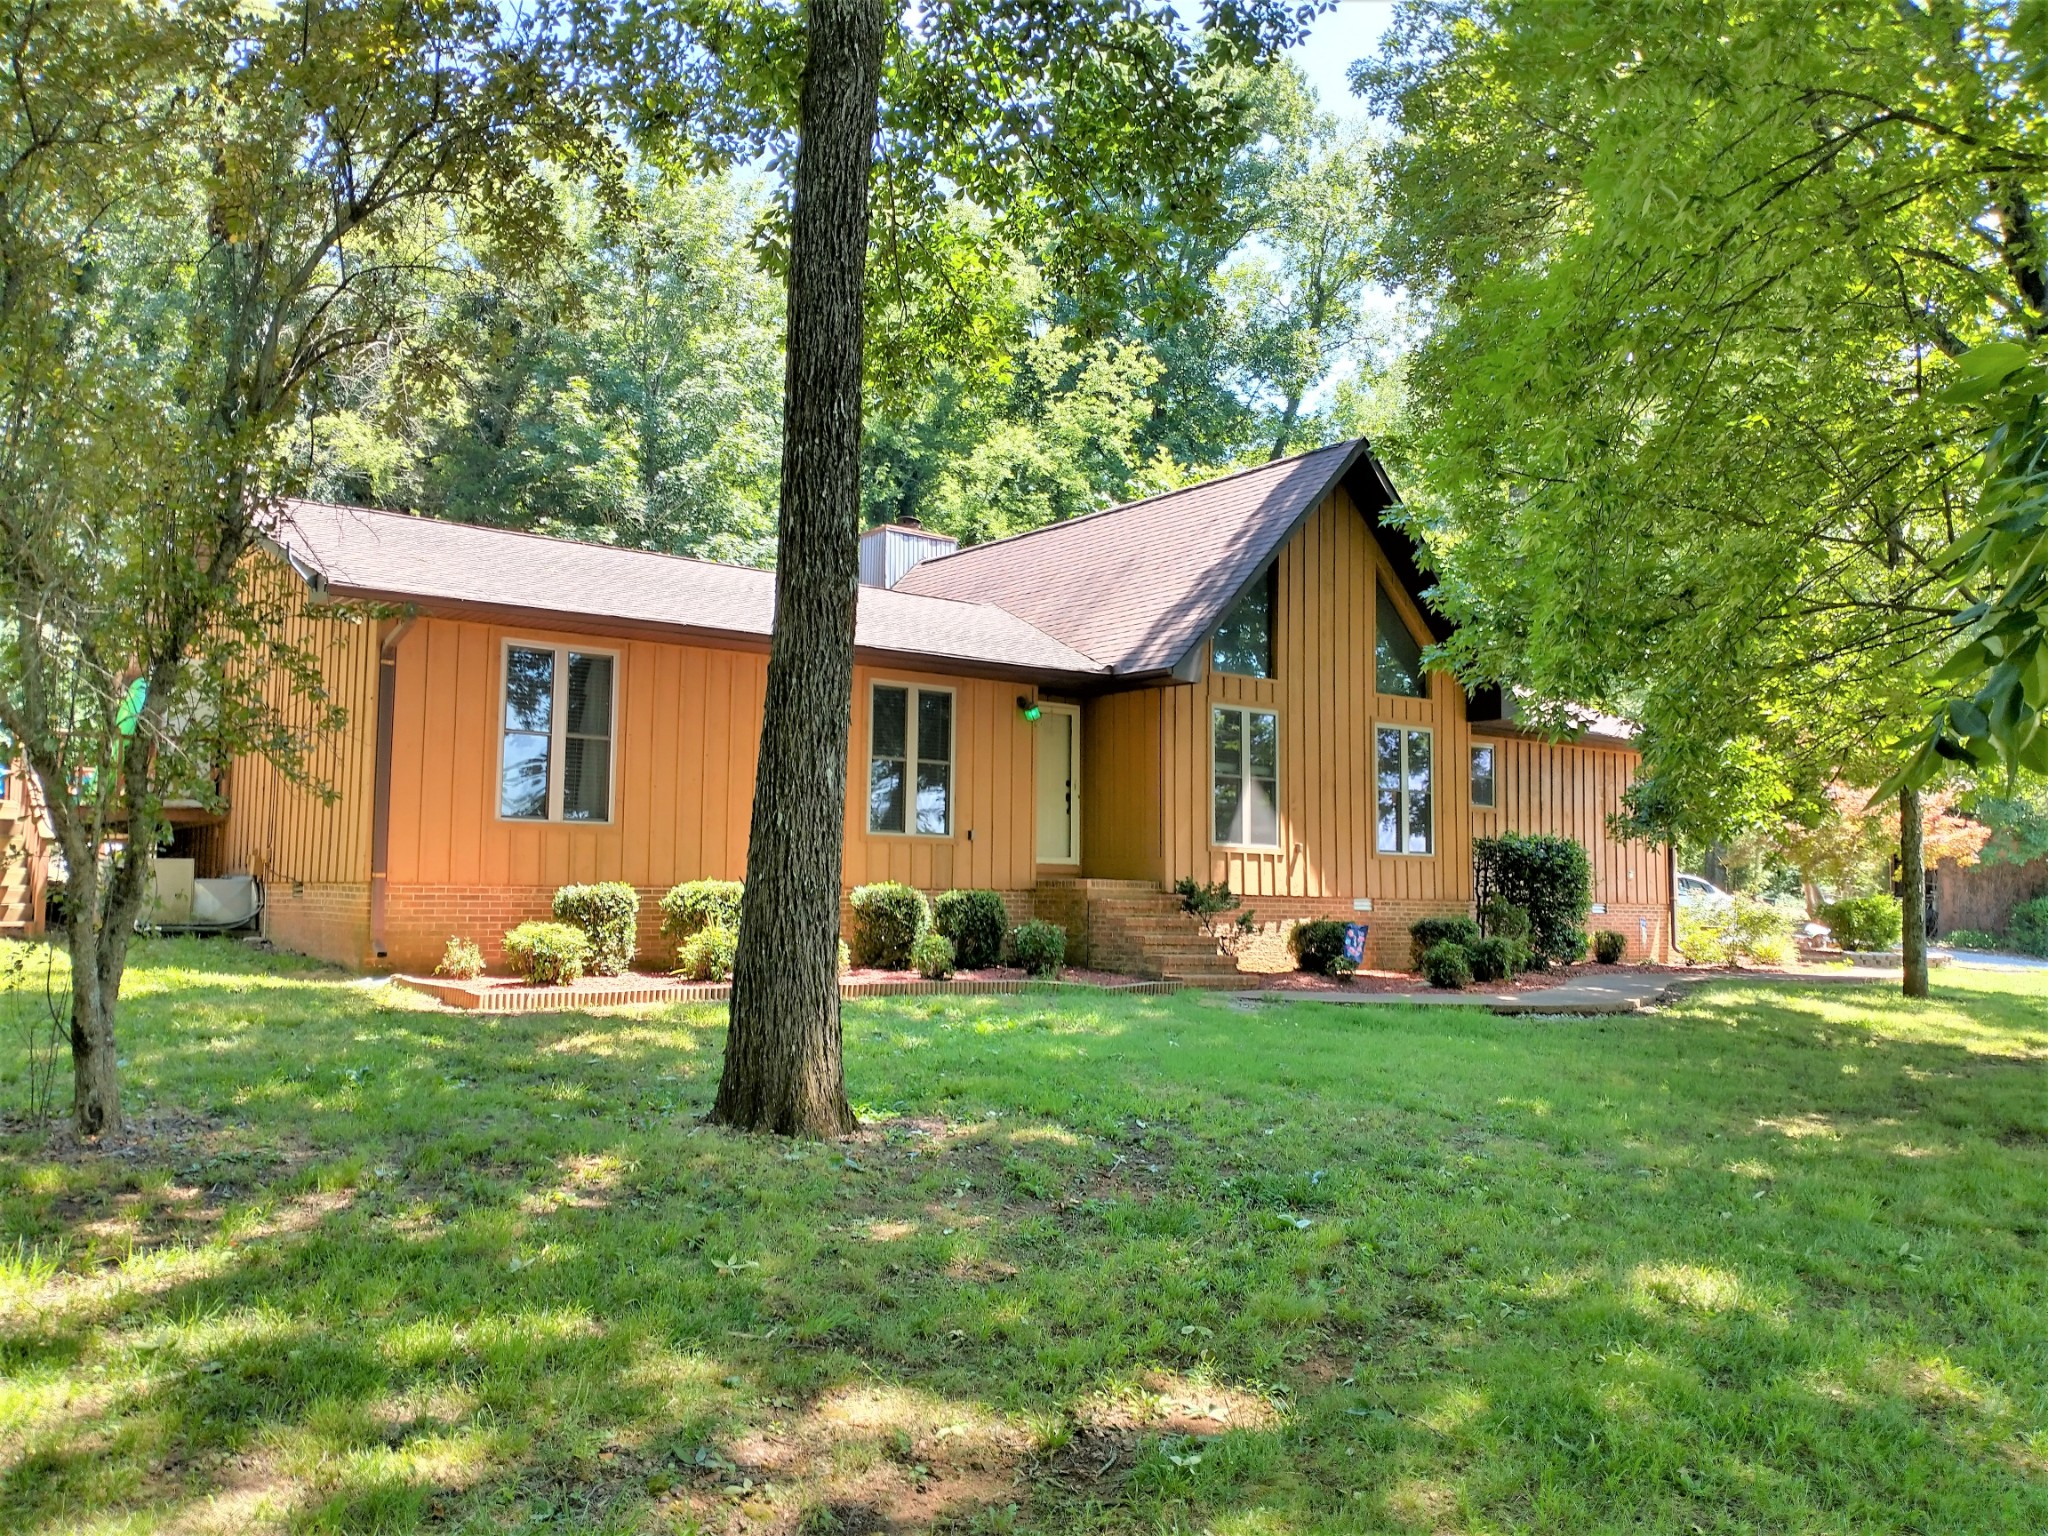 647 Carter Rd Property Photo - Decherd, TN real estate listing